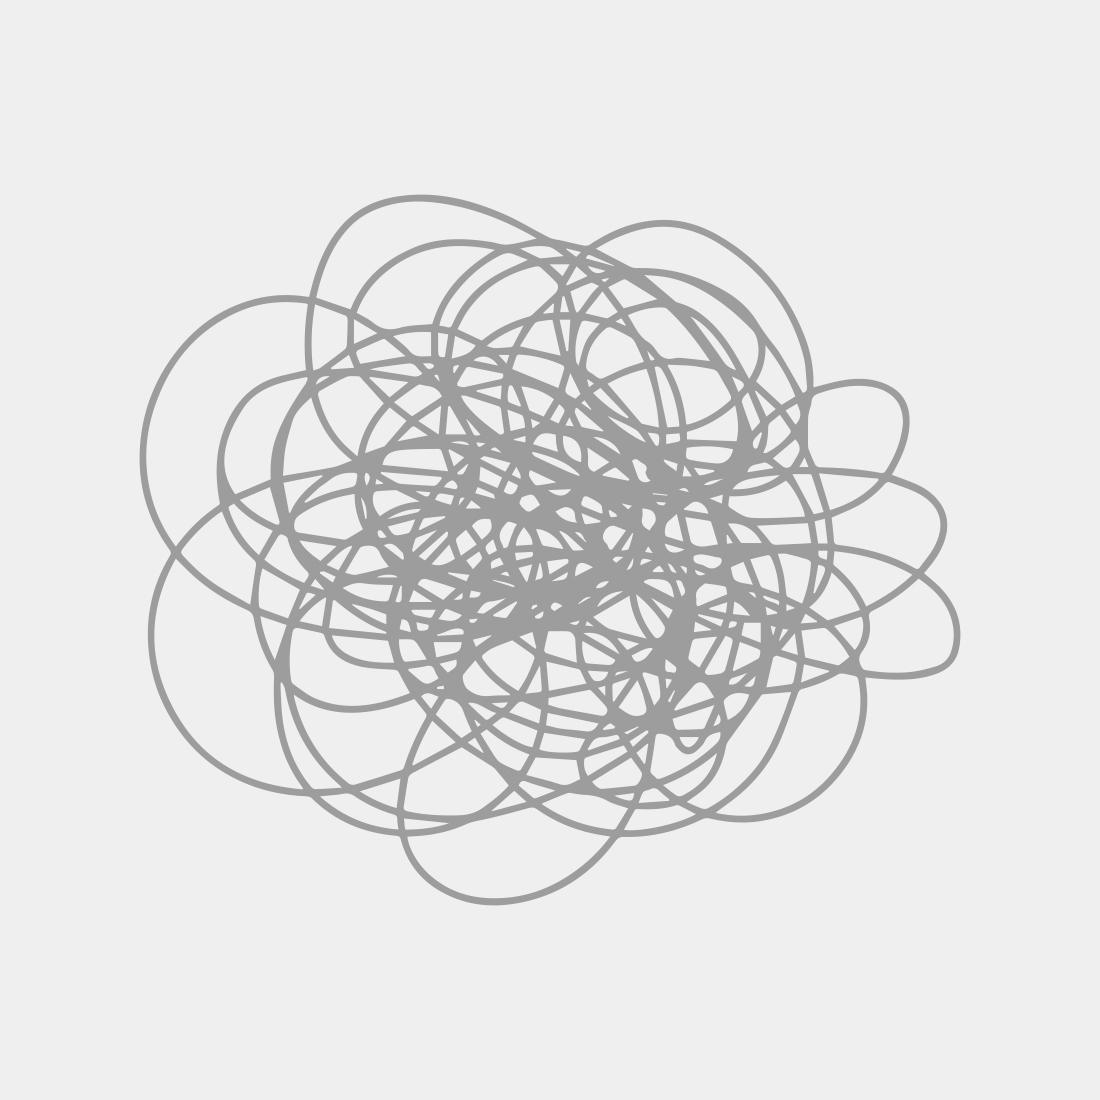 Albert Irvin OBE RA Untitled opus w.40